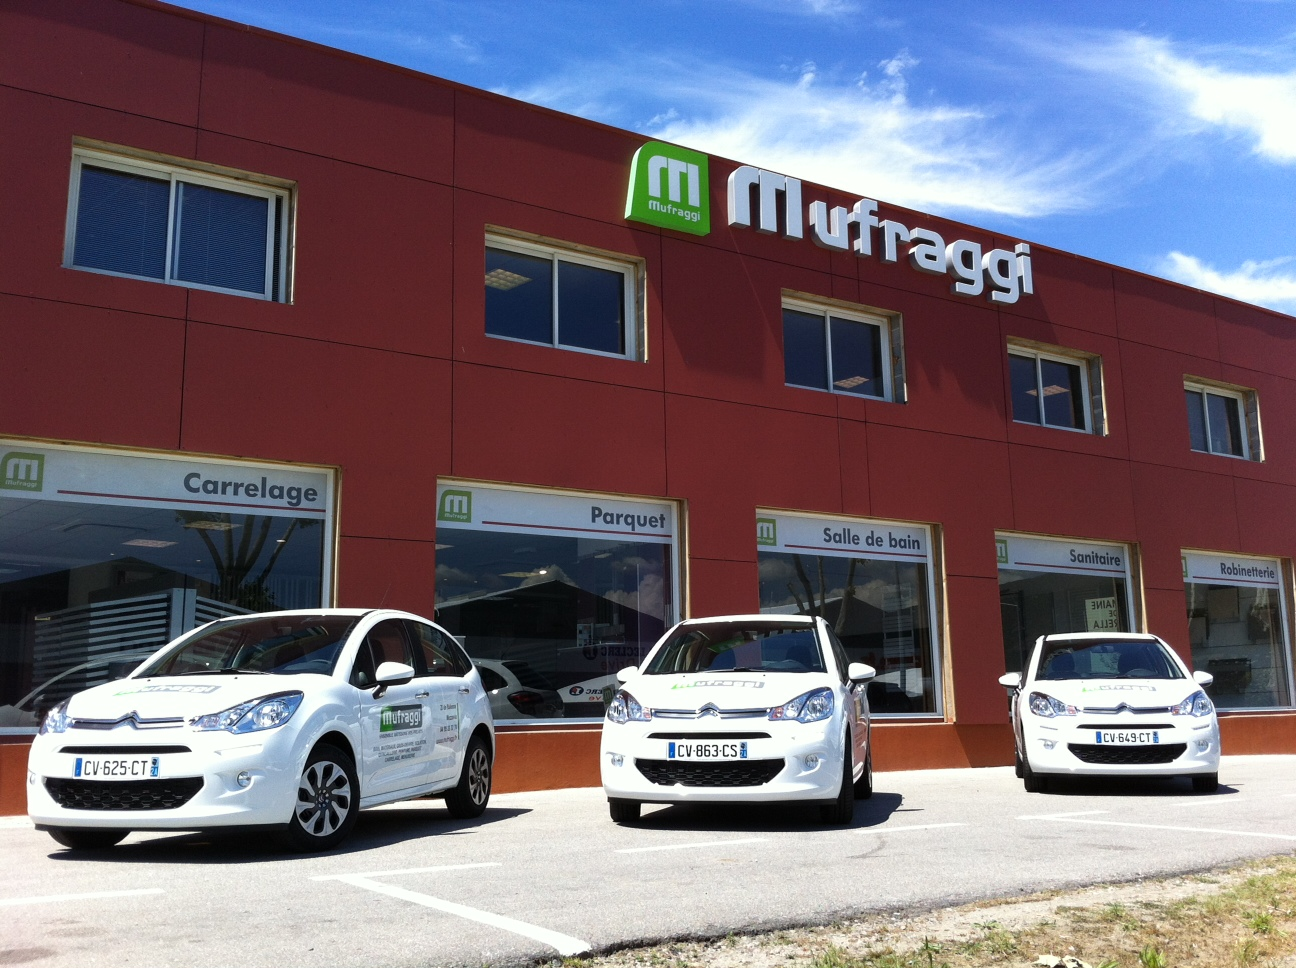 Le magasin de Mufraggi Matériaux à Ajaccio, ZI de Baléone